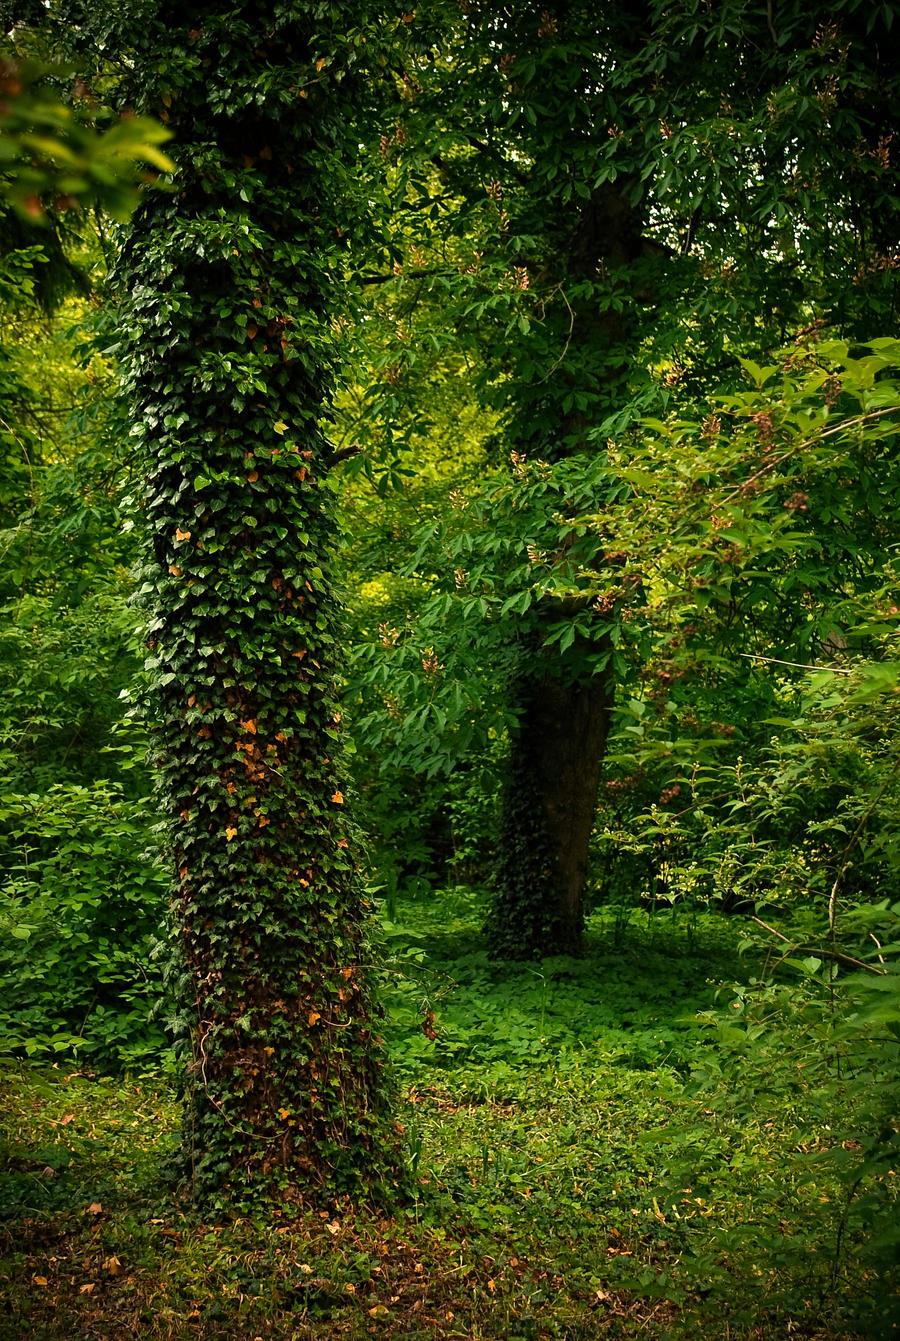 nature background wallpaper - photo #5